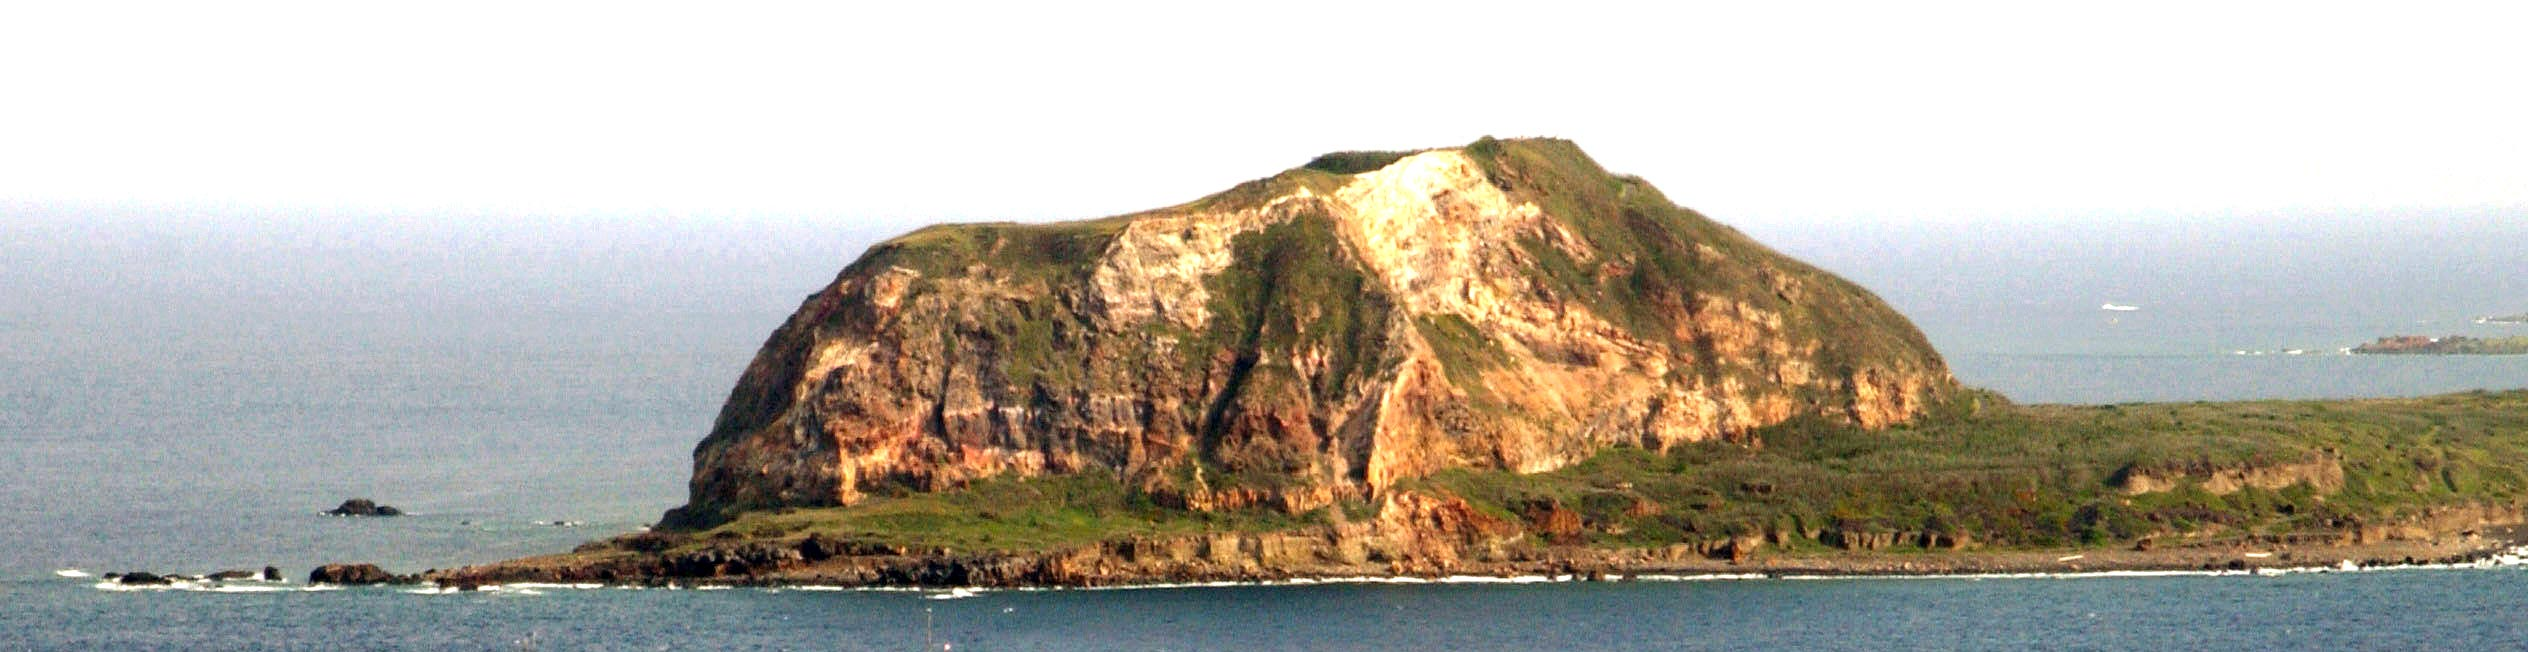 Mt. Suribachi